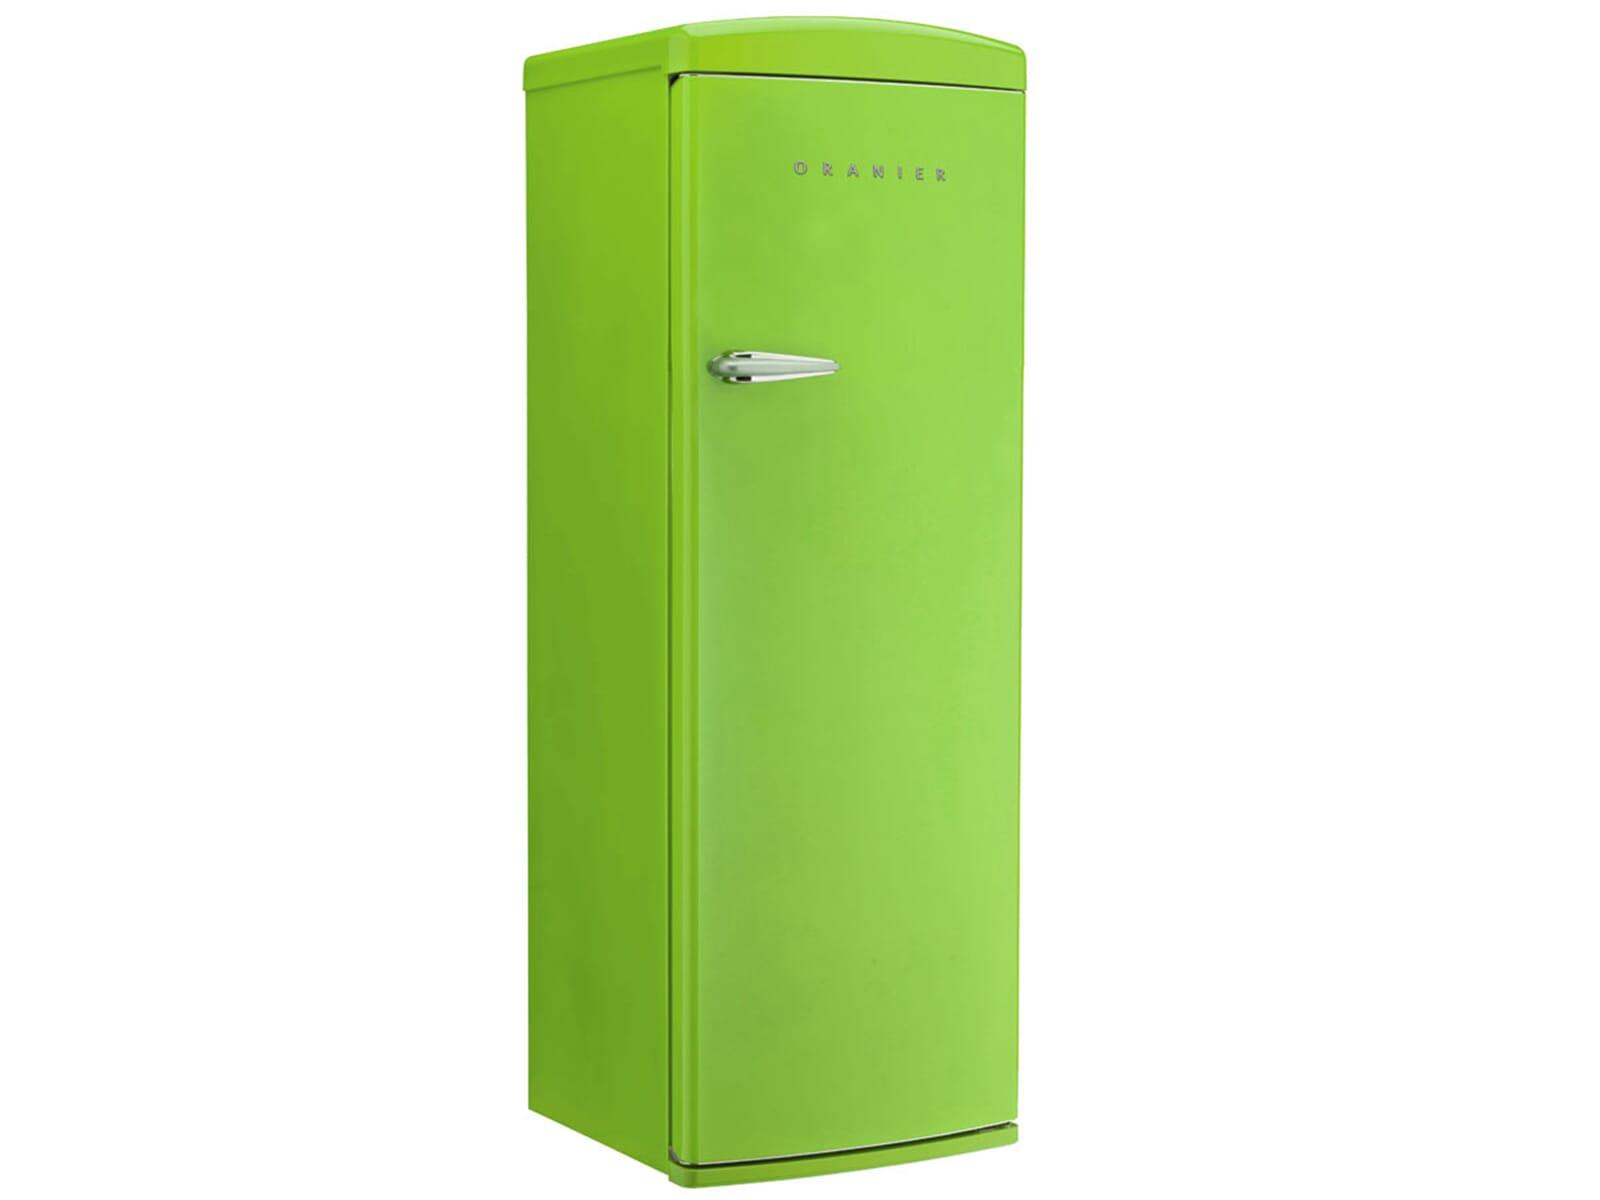 Retro Kühlschrank Oranier : Standkühlschrank retro oranier rks standgerät kühlschrank